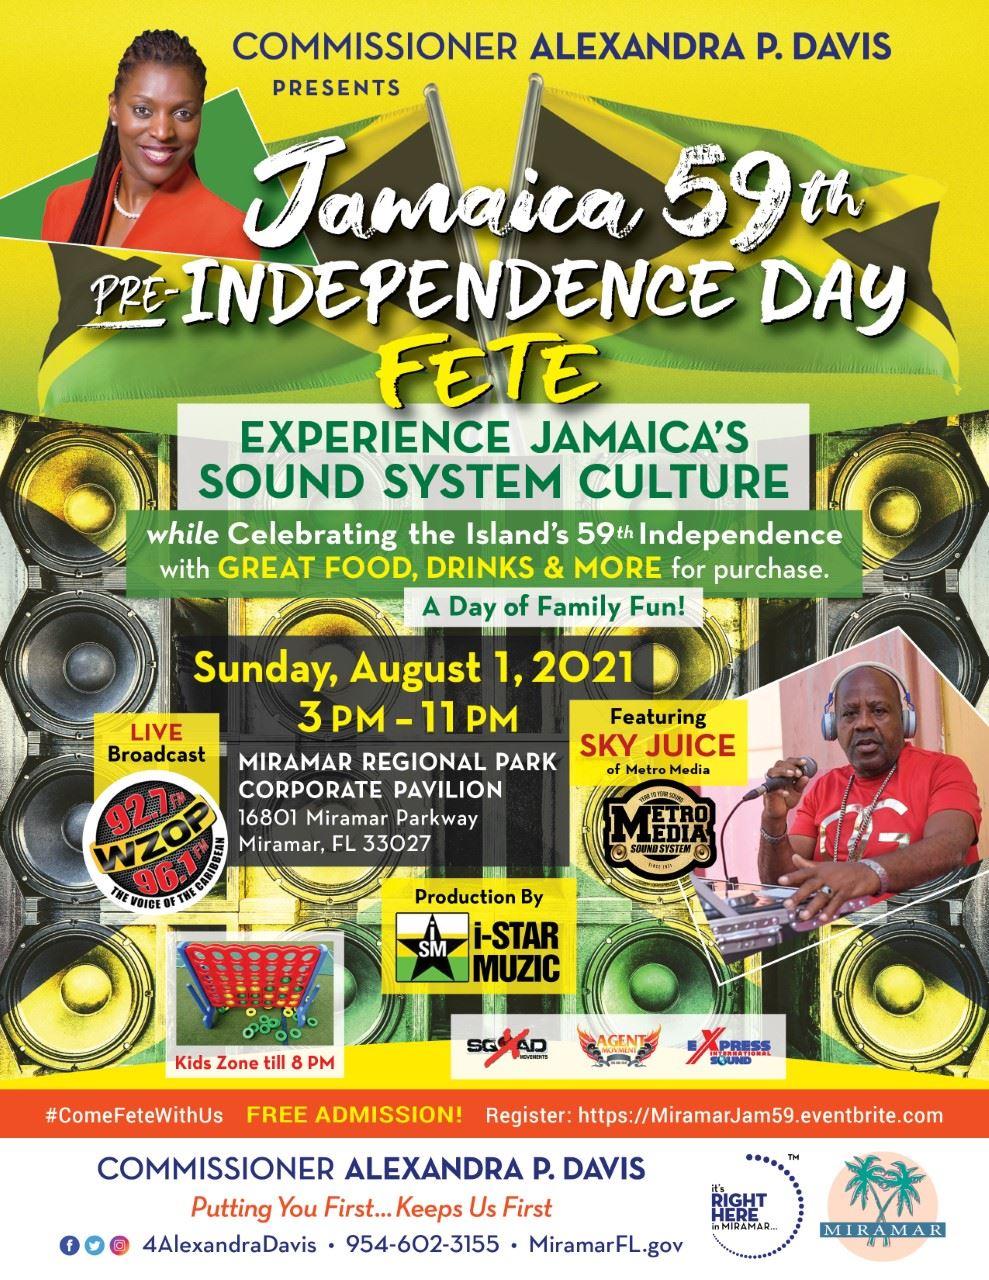 Commissioner Davis Jamaica 59th Fete Flyer Proof-ML3